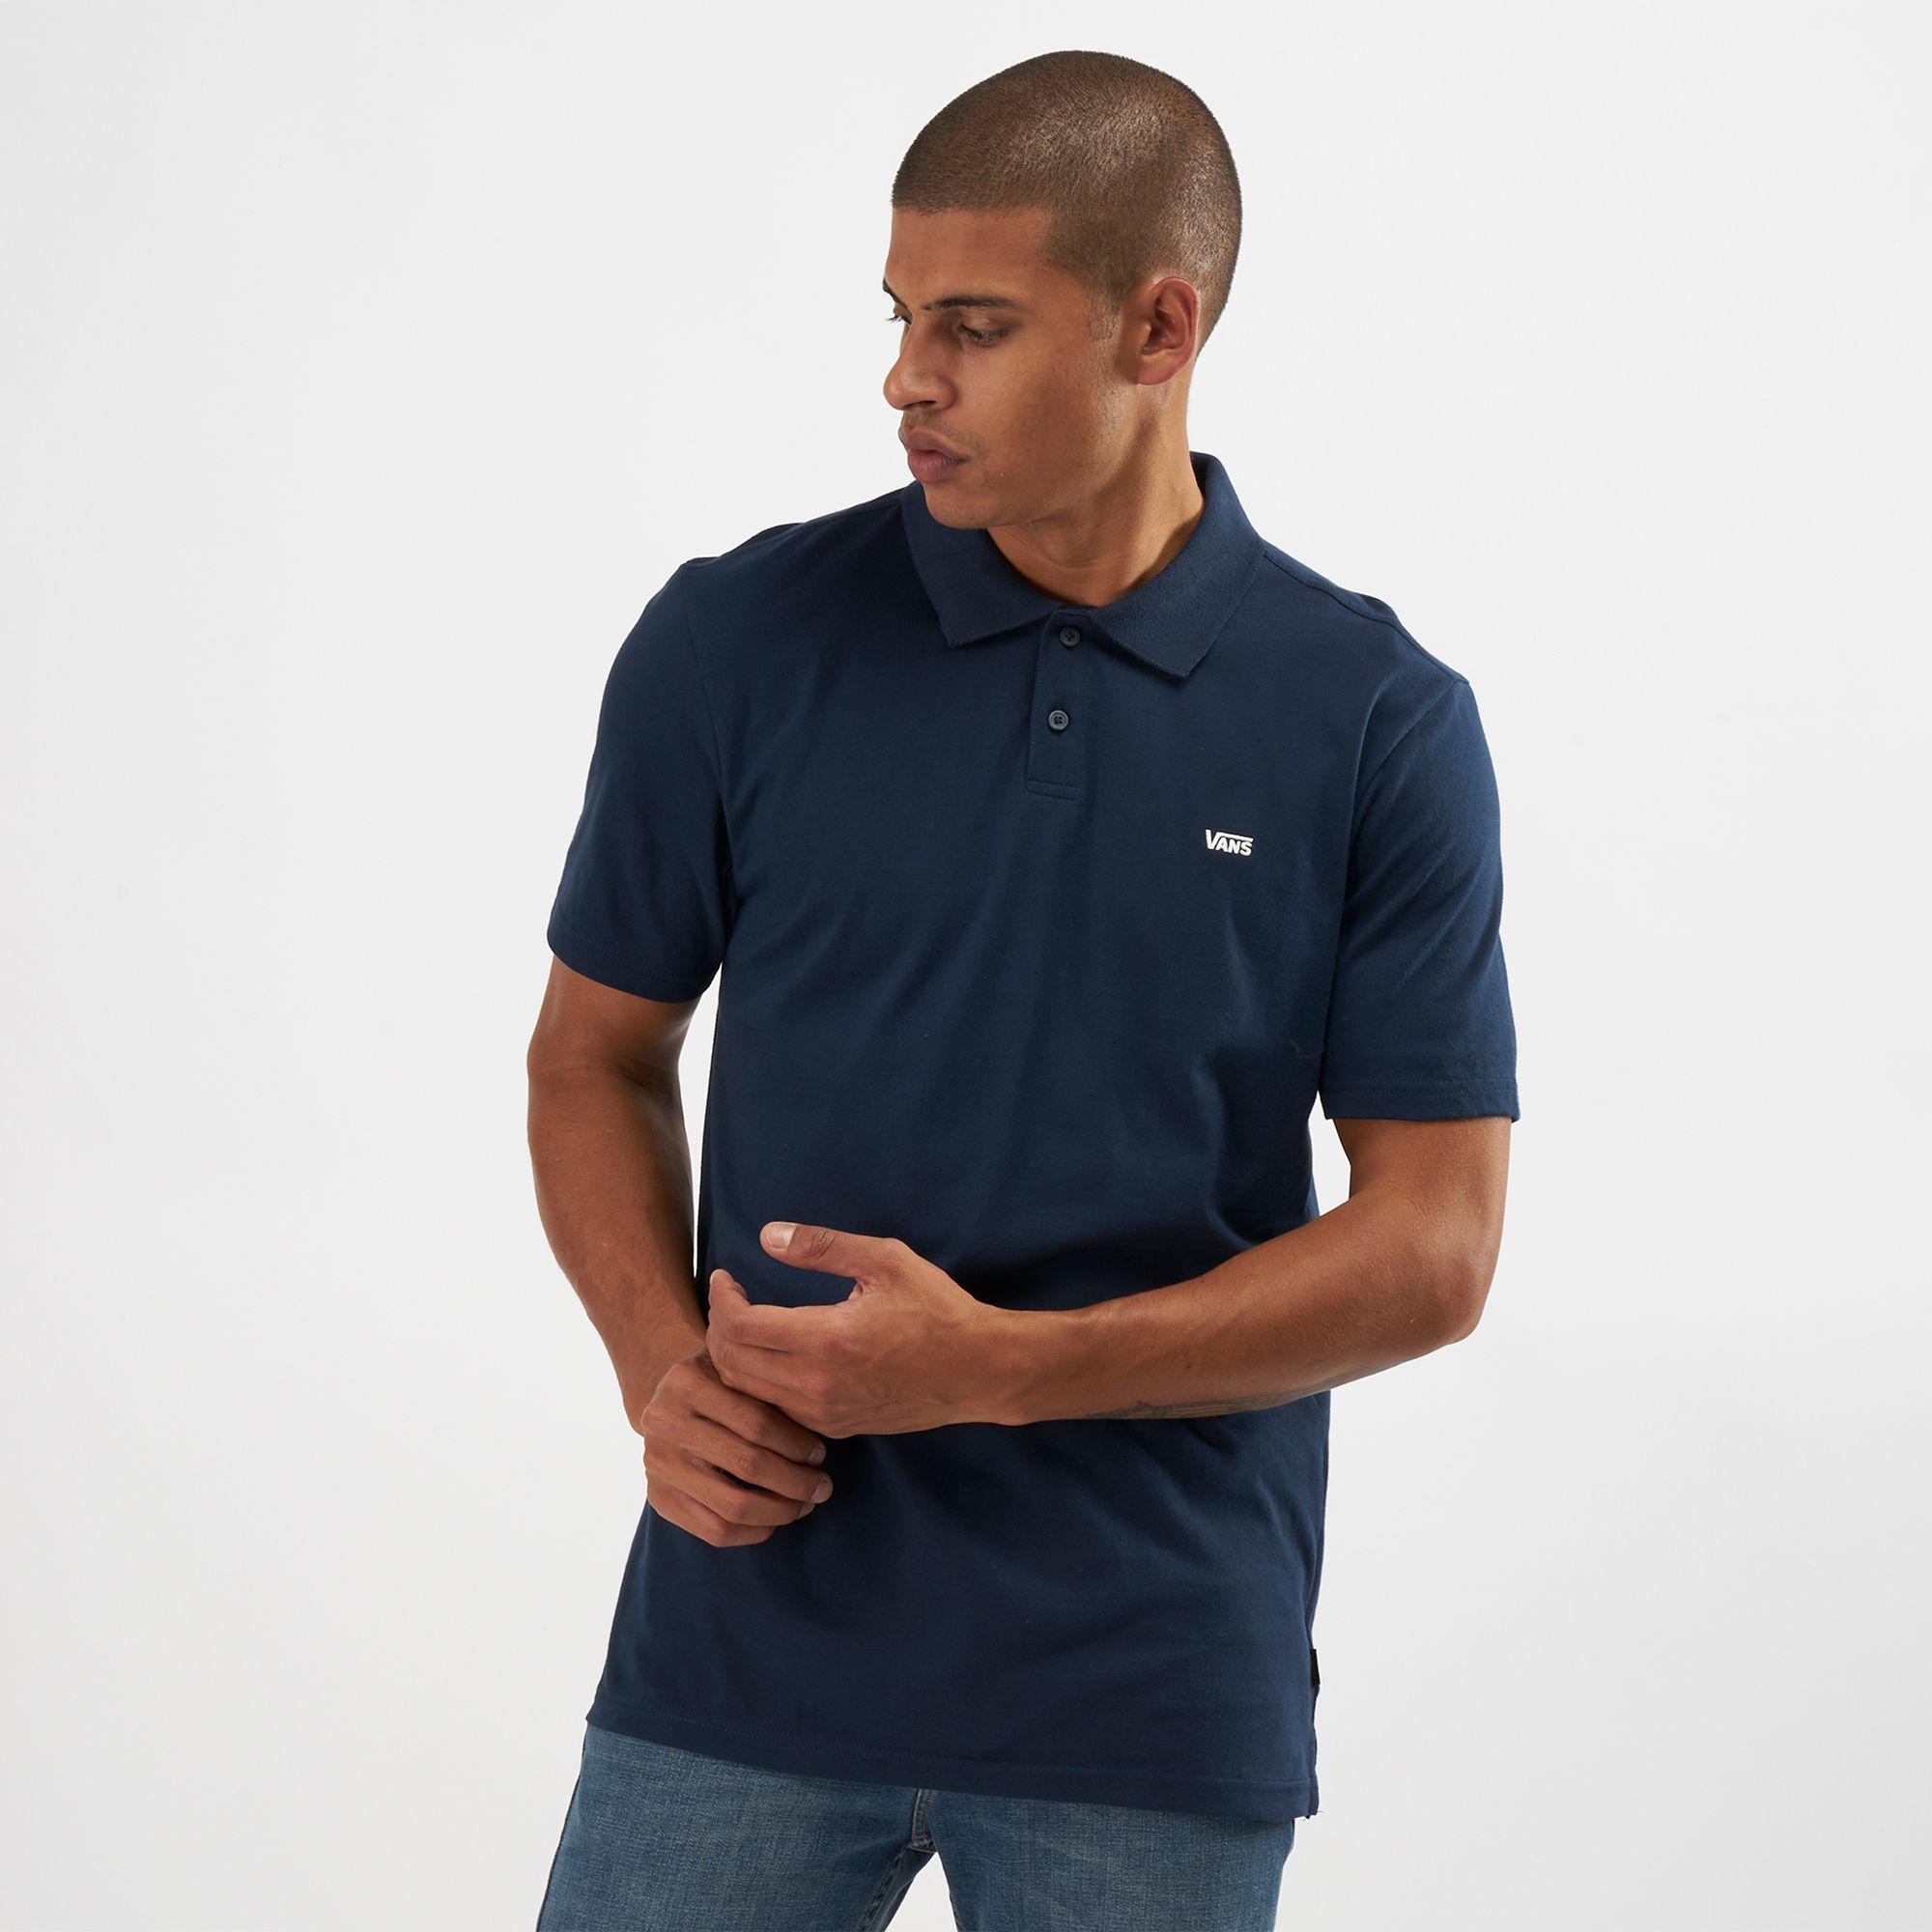 1ab70e941d Vans Classic Polo T-Shirt | Polo Shirts | Tops | Clothing | Men'S Sale |  Sale |VAHLHLKZ | SSS